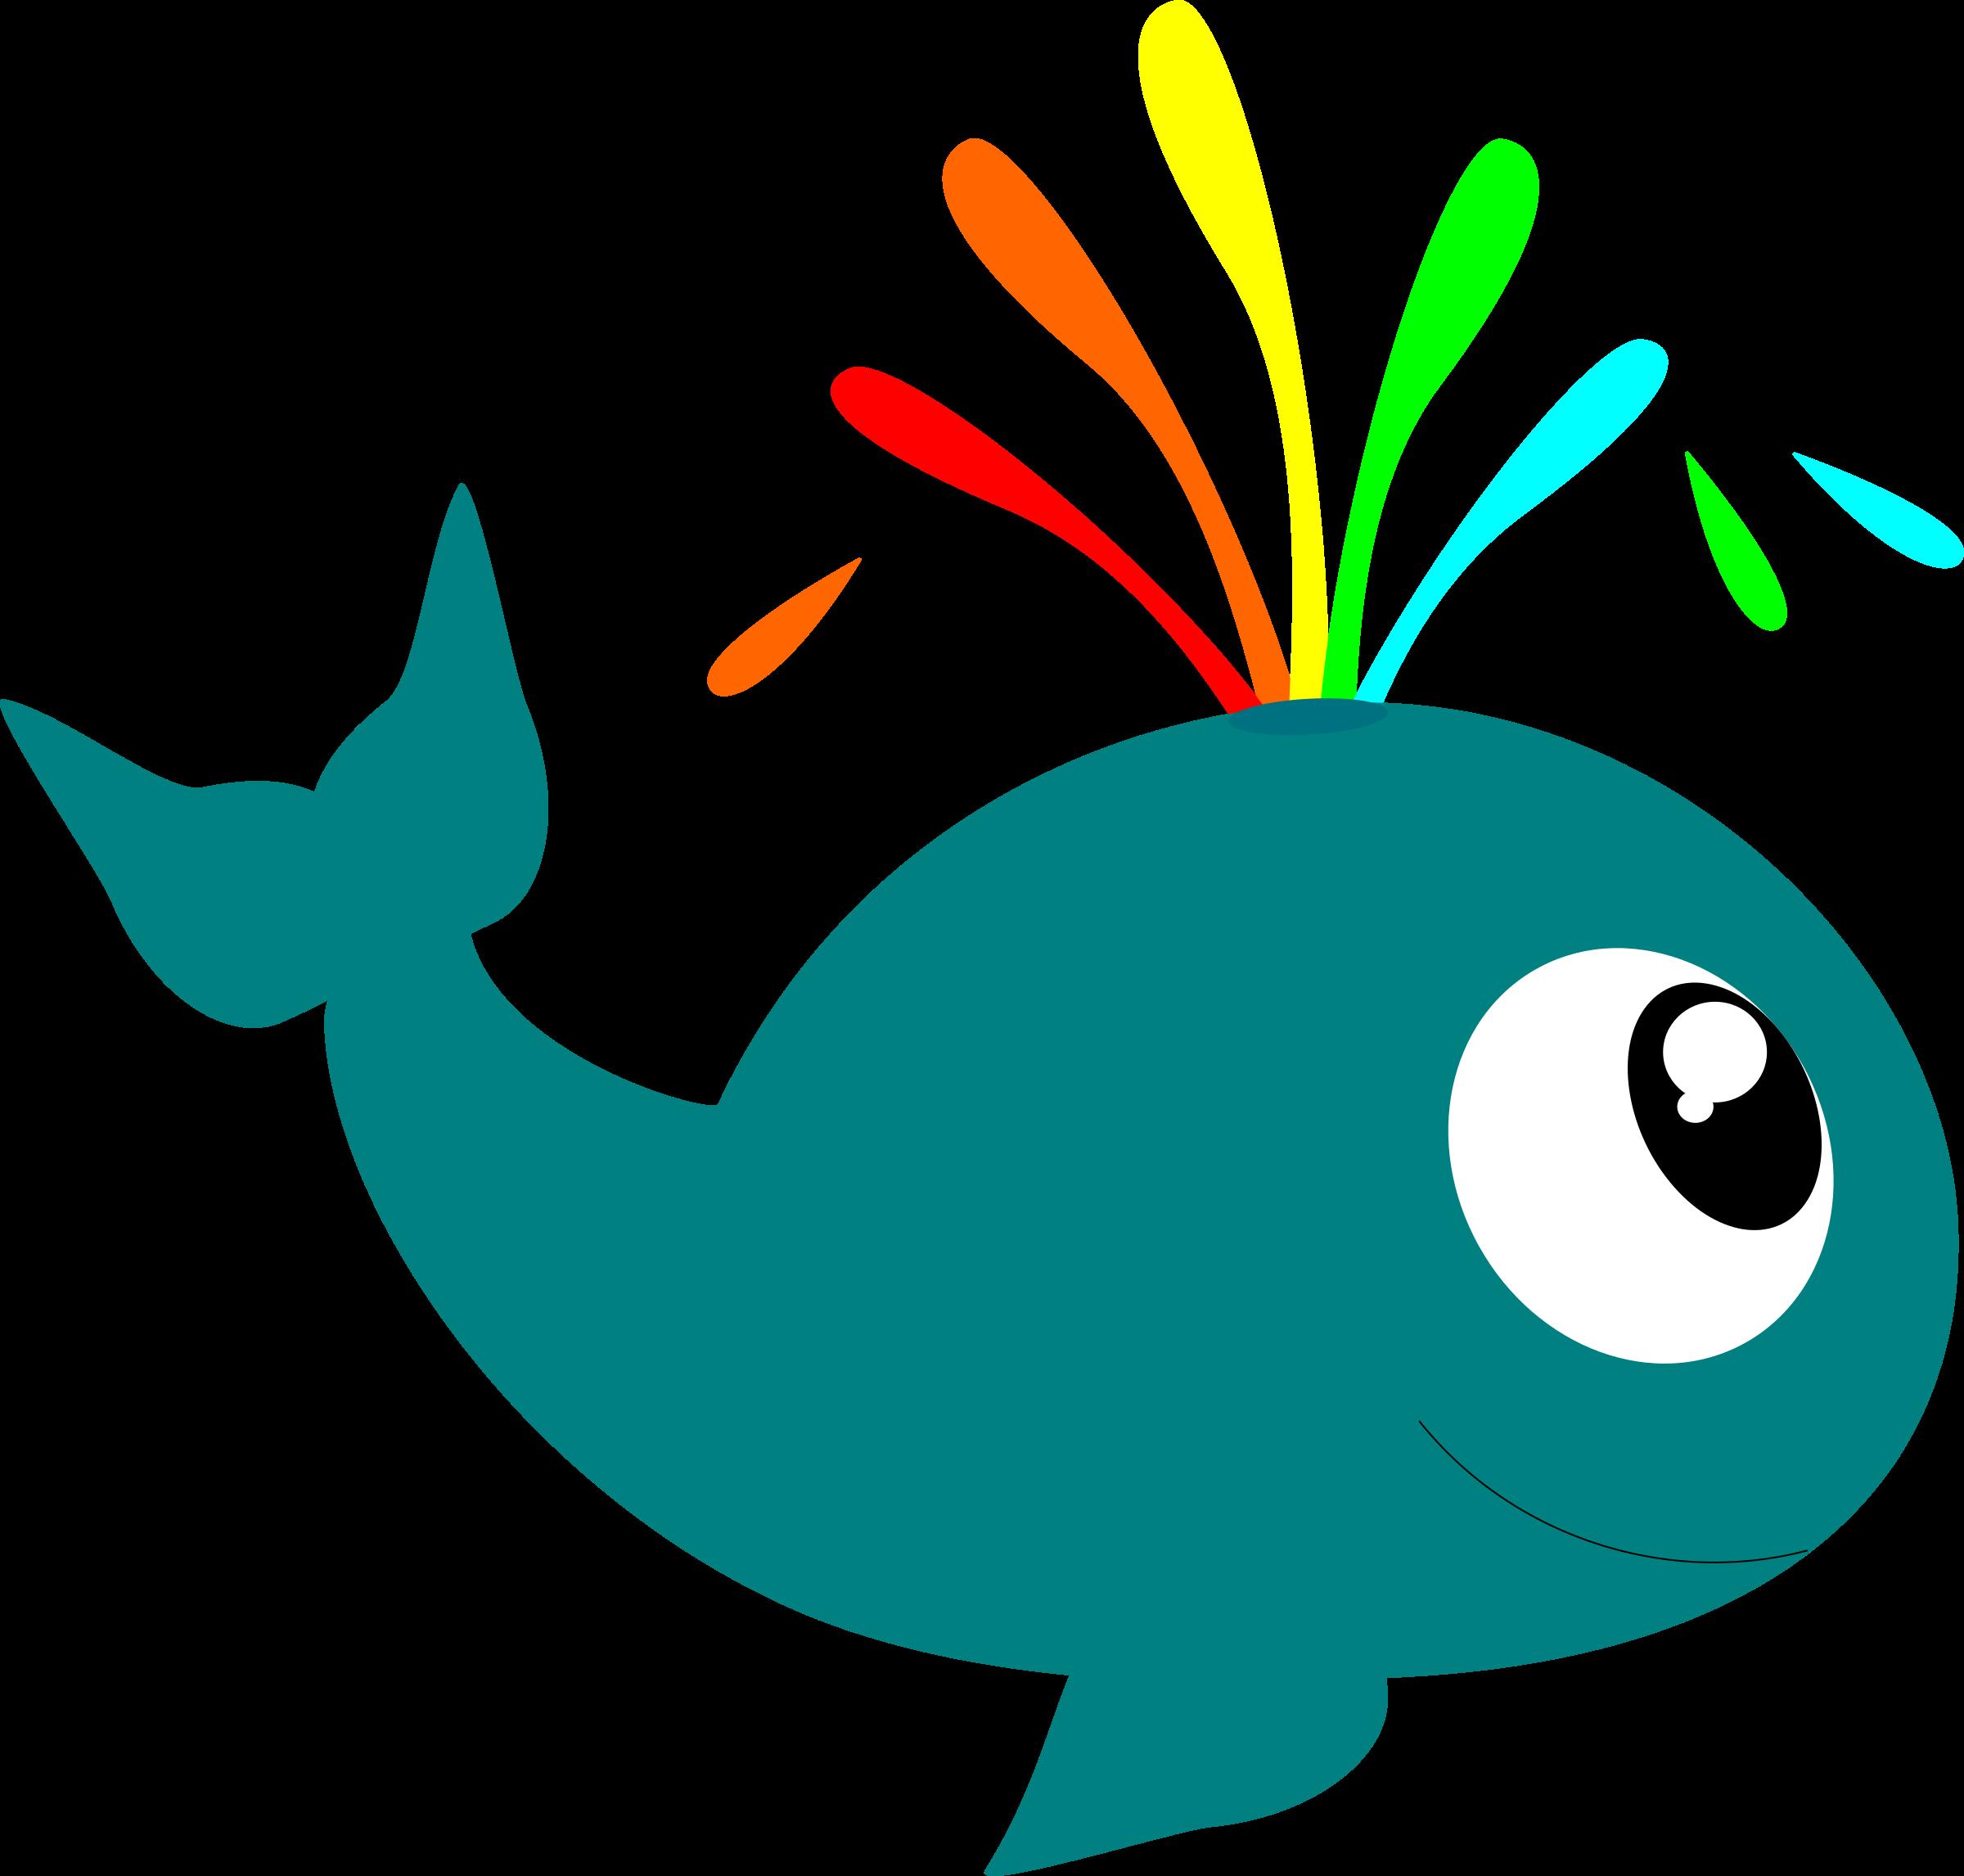 Aquatic animal deep sea. Clipart water whale